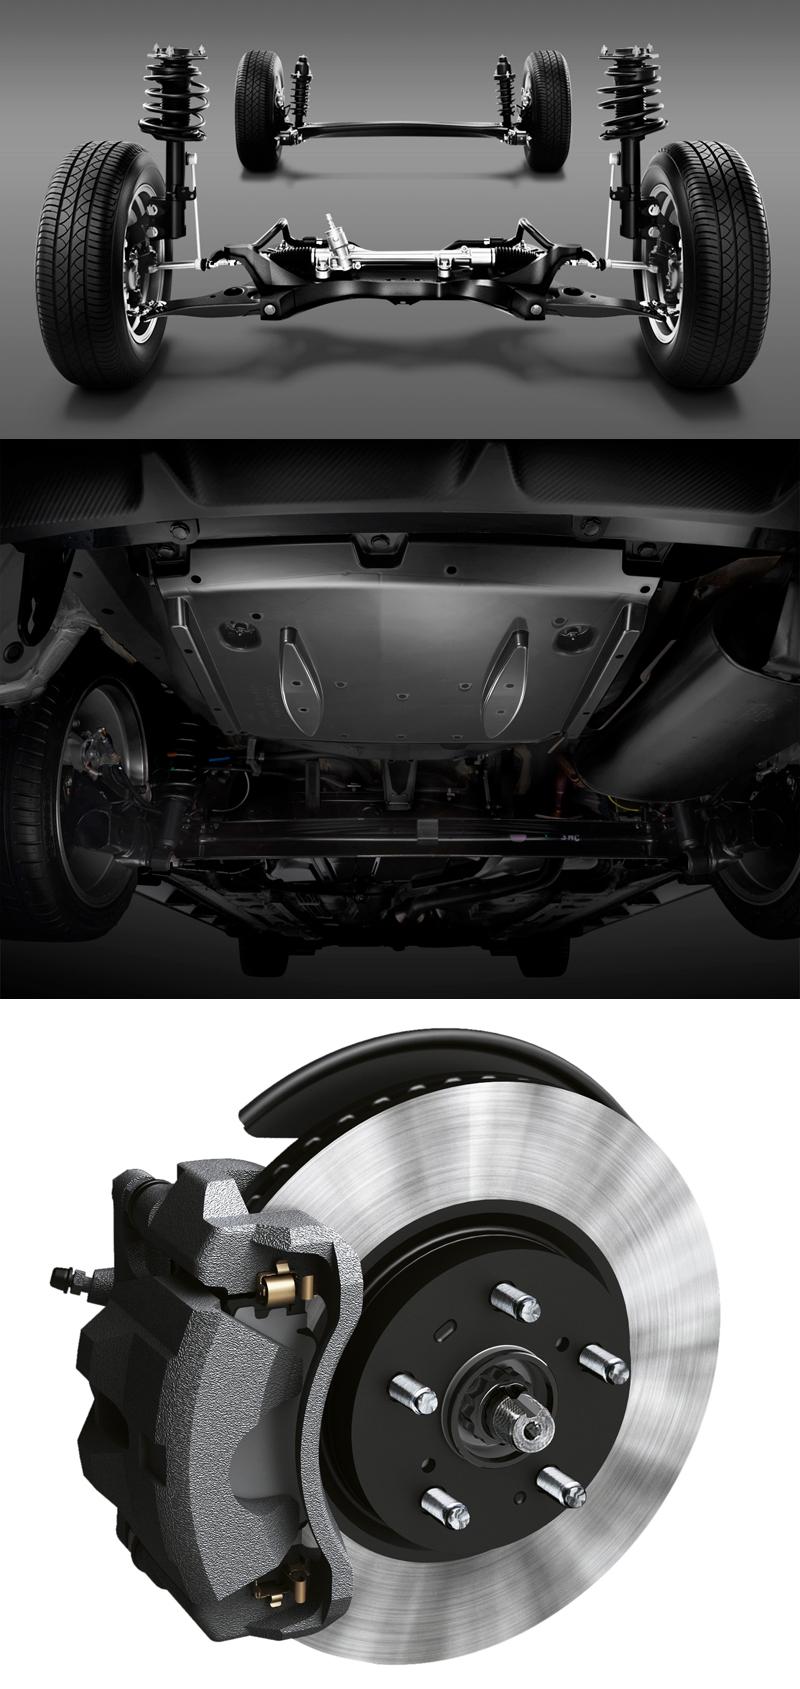 2014_06_Toyota_Corolla_Altis_Engine_08_Suspension_Brake